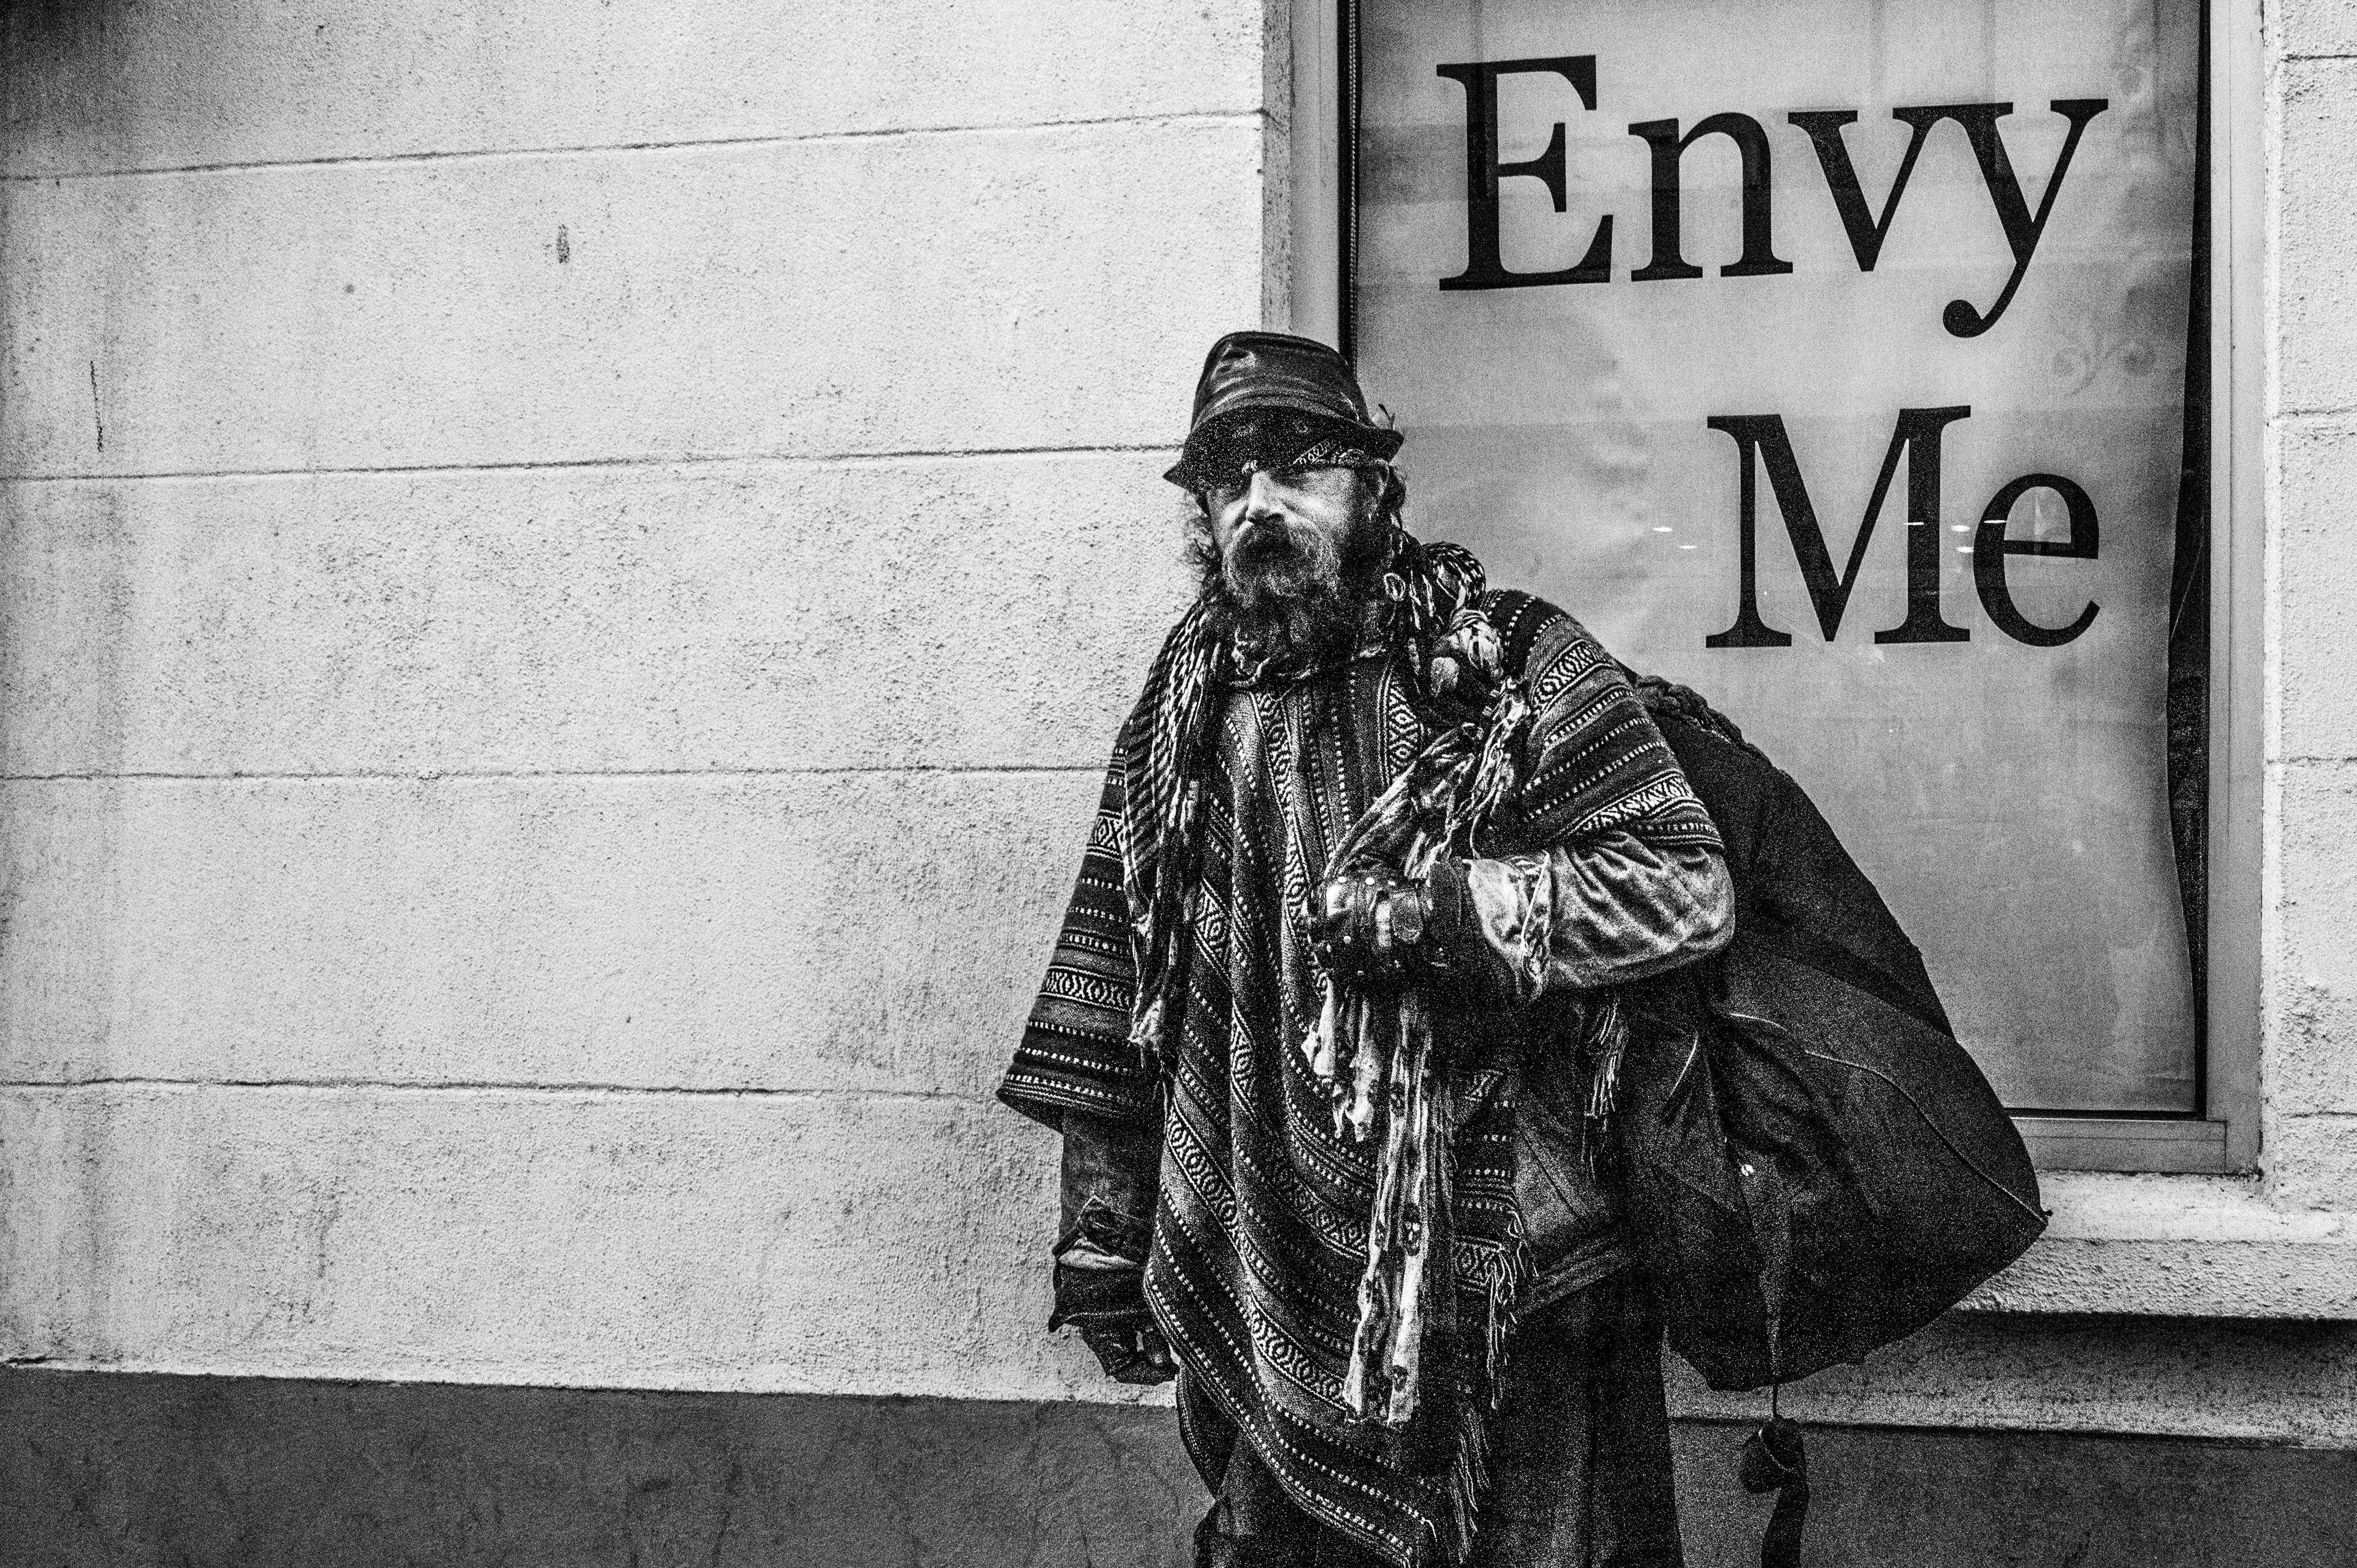 #StreetPortraitOfDjilali #Djilali #Paris 11 #Homeless #PoorButNiceGuyAnyway #CamilleGabarra © Camille Gabarra #photographer #portrait